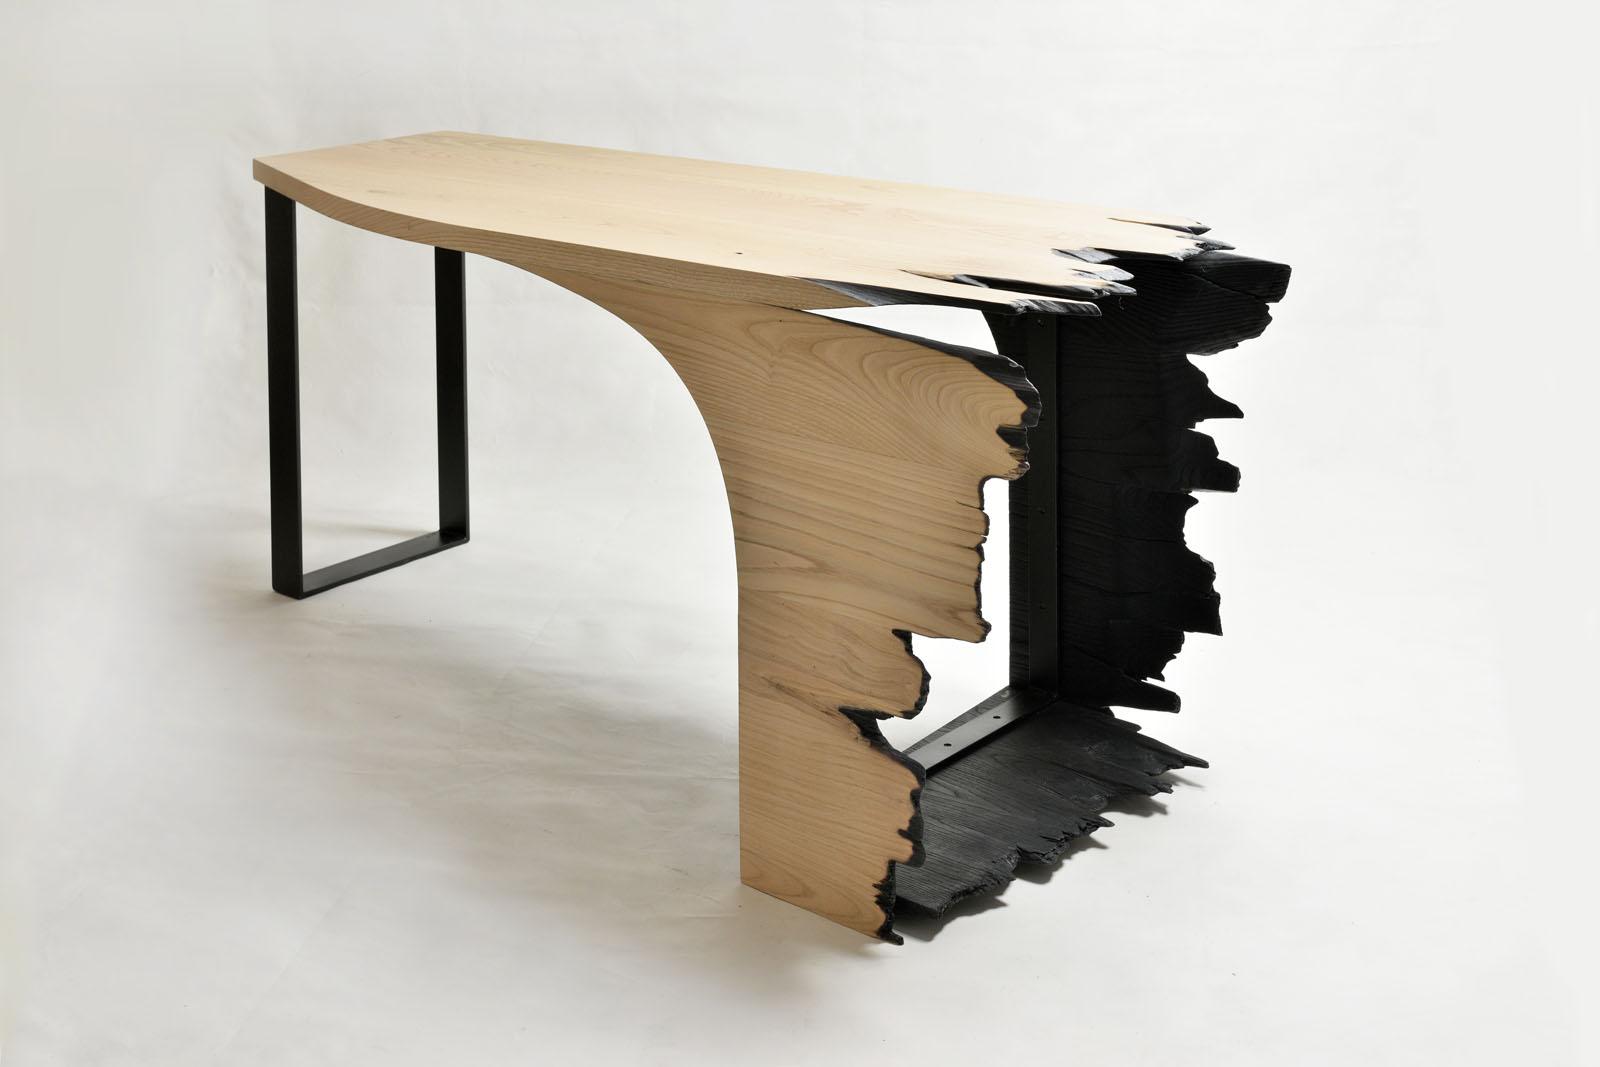 Jose Pablo Arriaga # Muebles Humanos